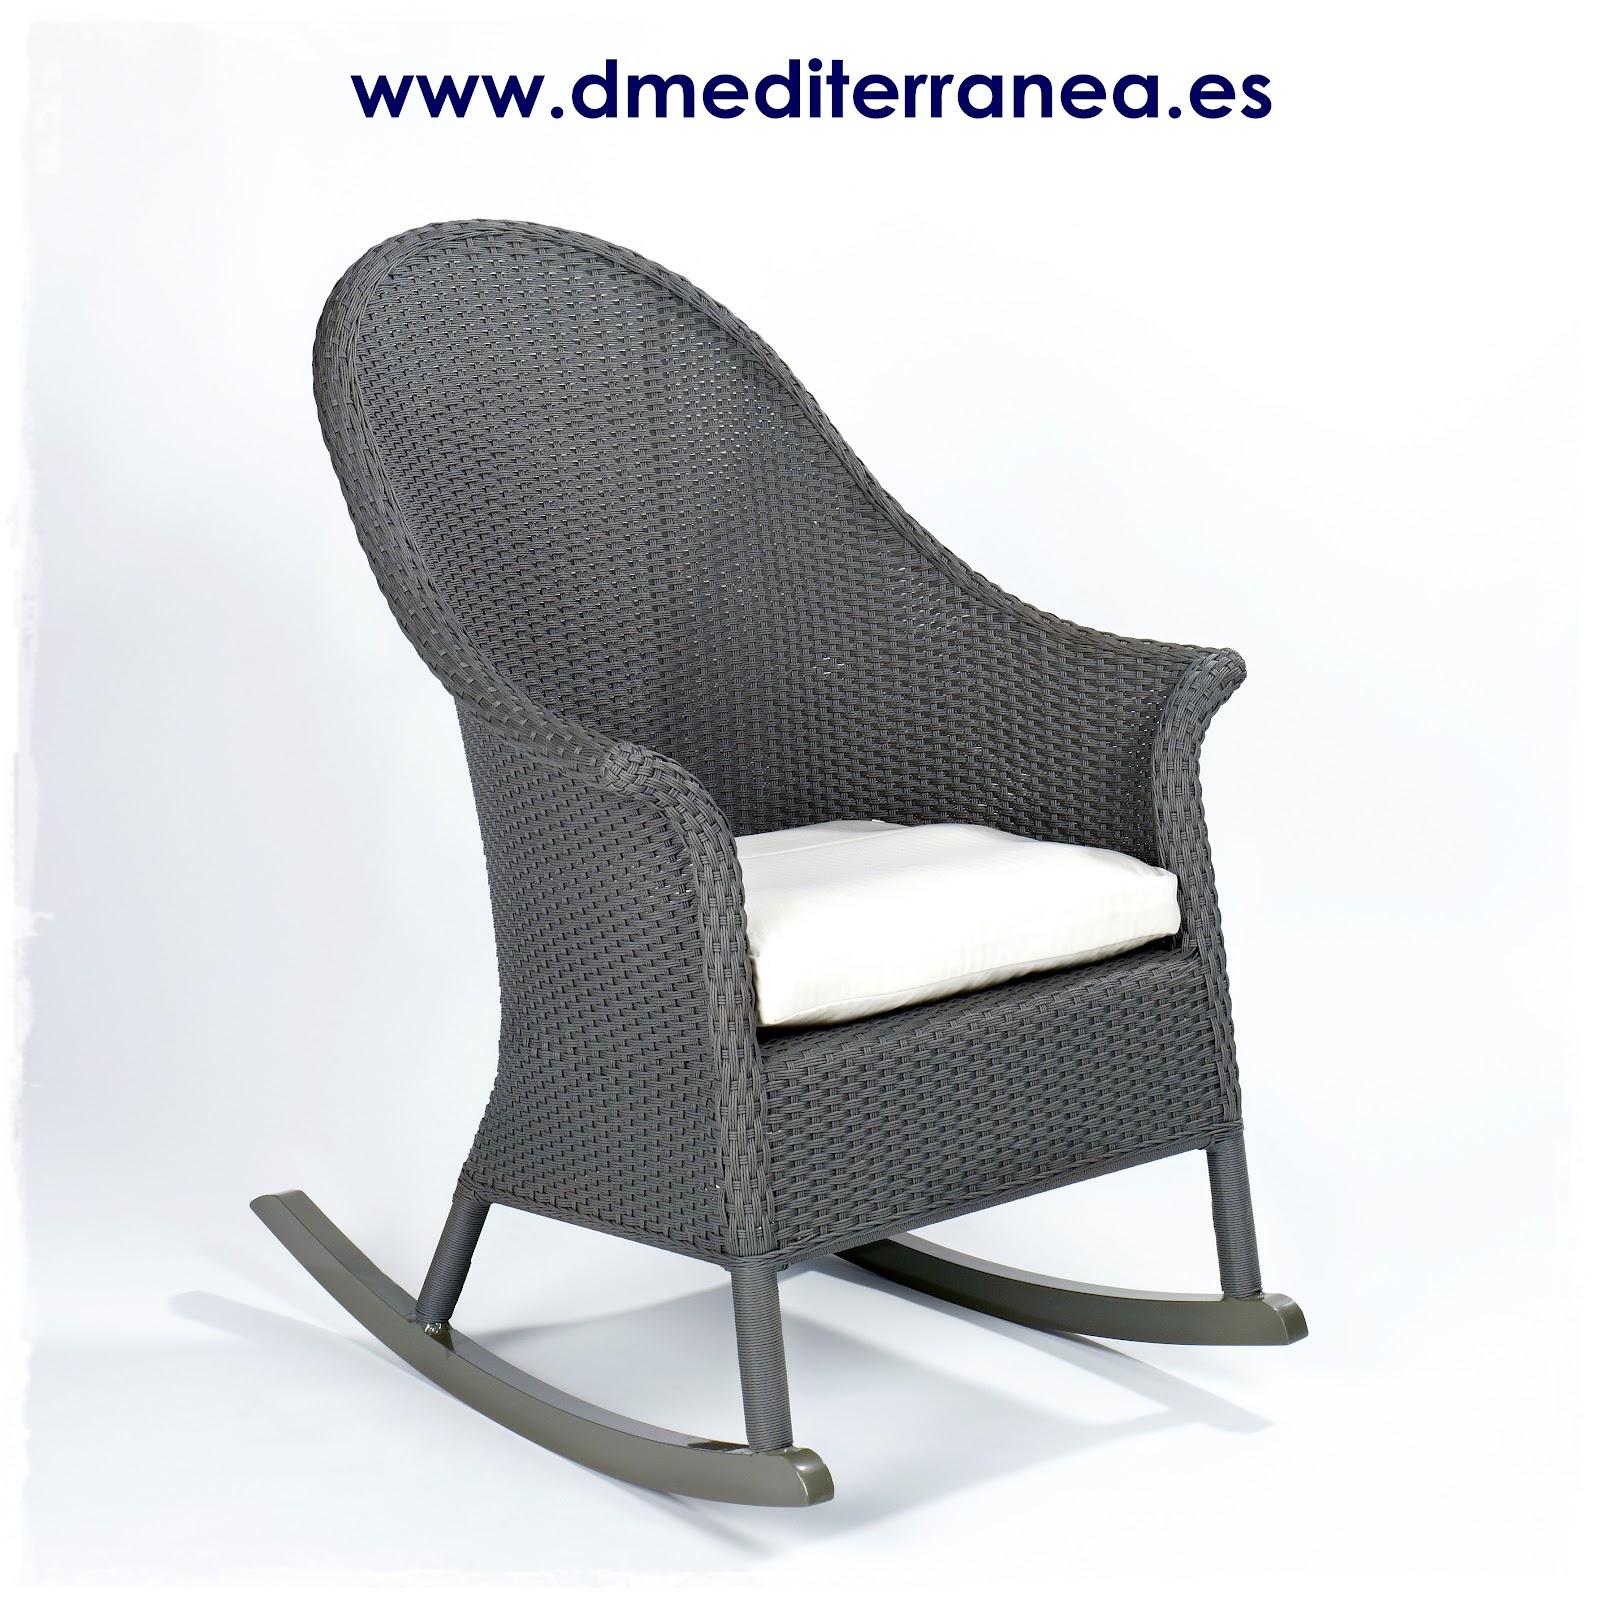 Imediterranea decoraci n interiorismo mobiliario jard n for Mobiliario jardin rattan